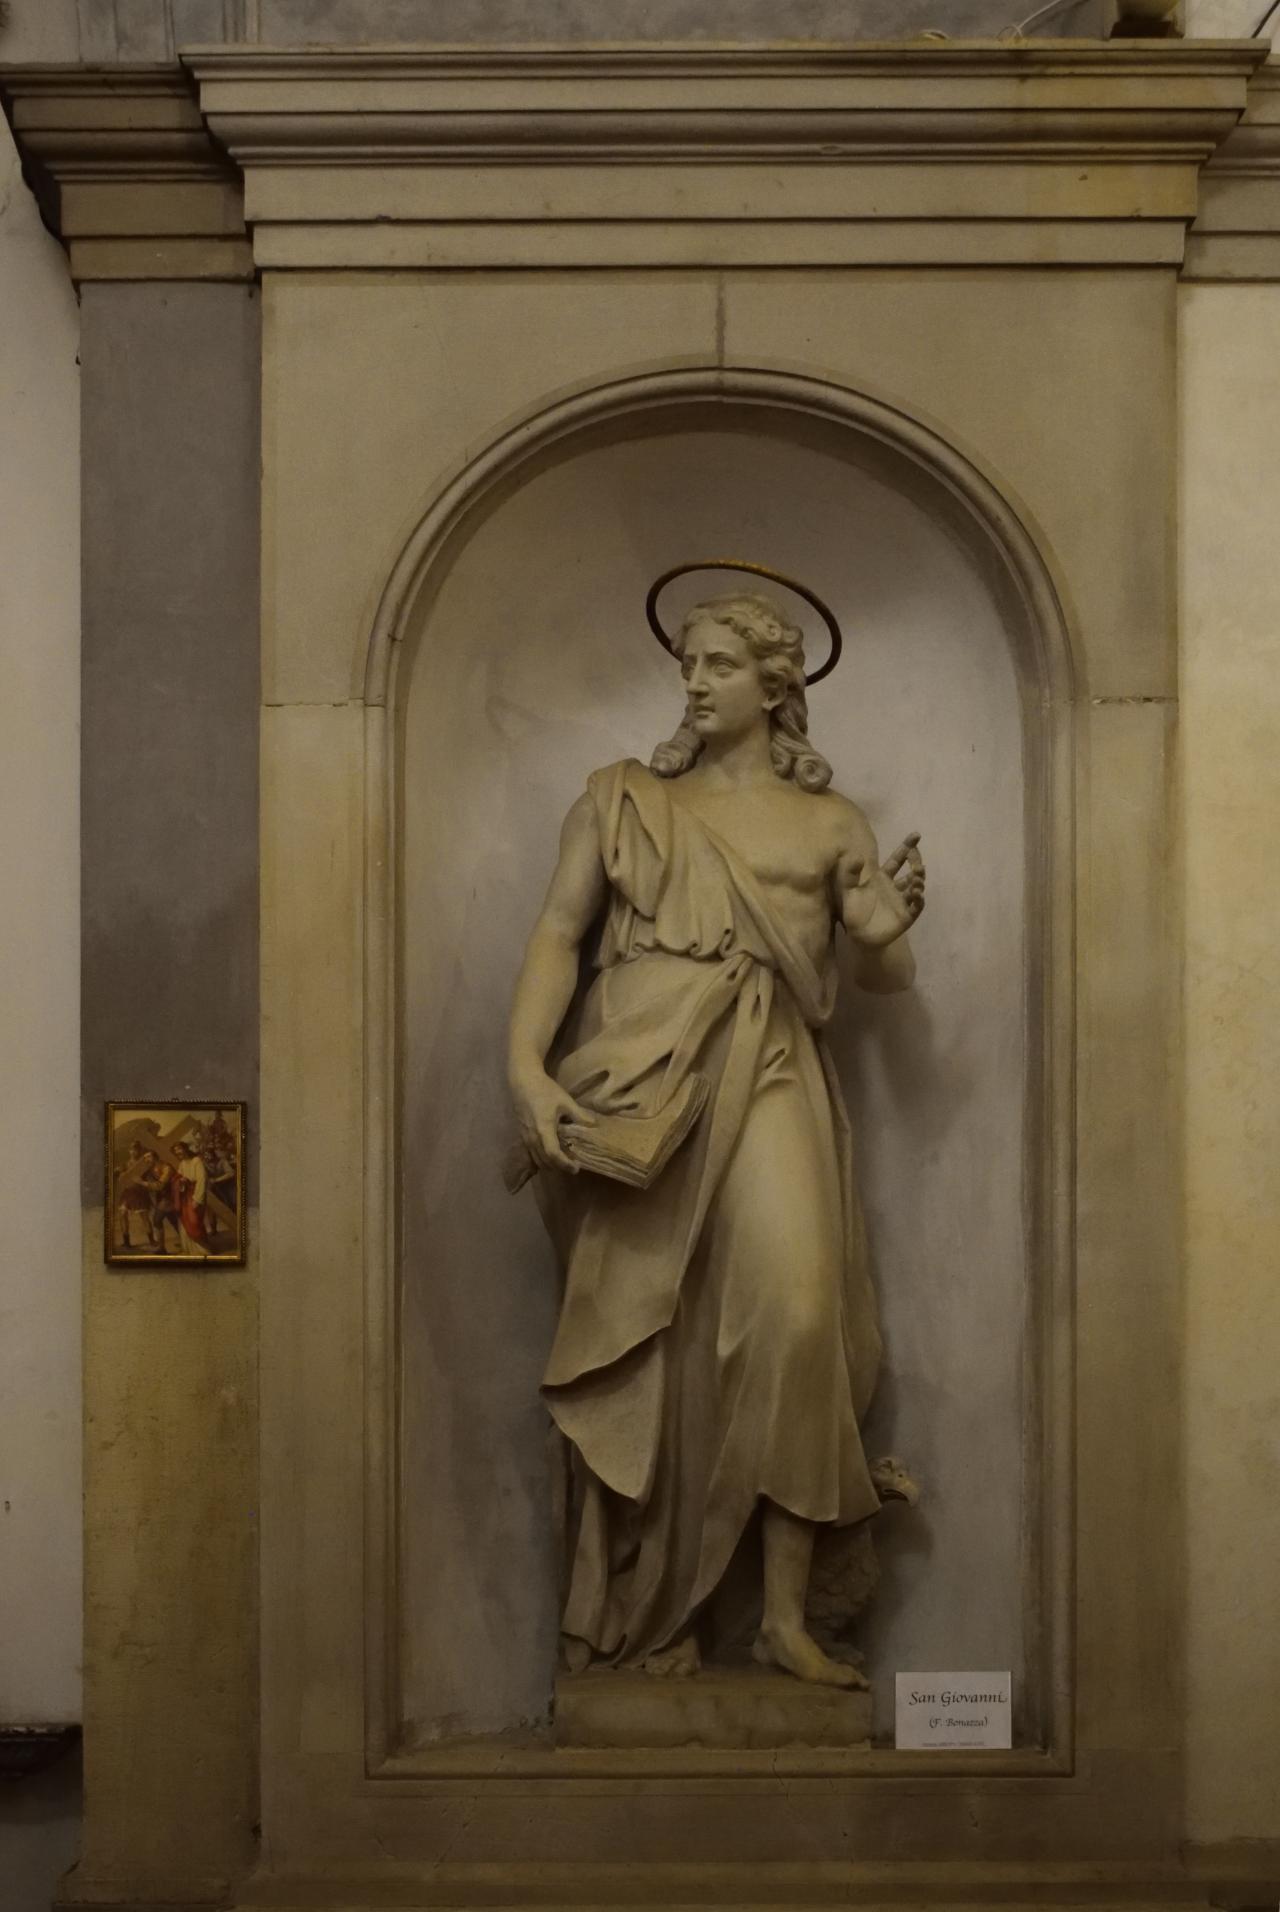 Oratorio di Santa Margherita - Padova - Lato destro - San Giovanni Evangelista